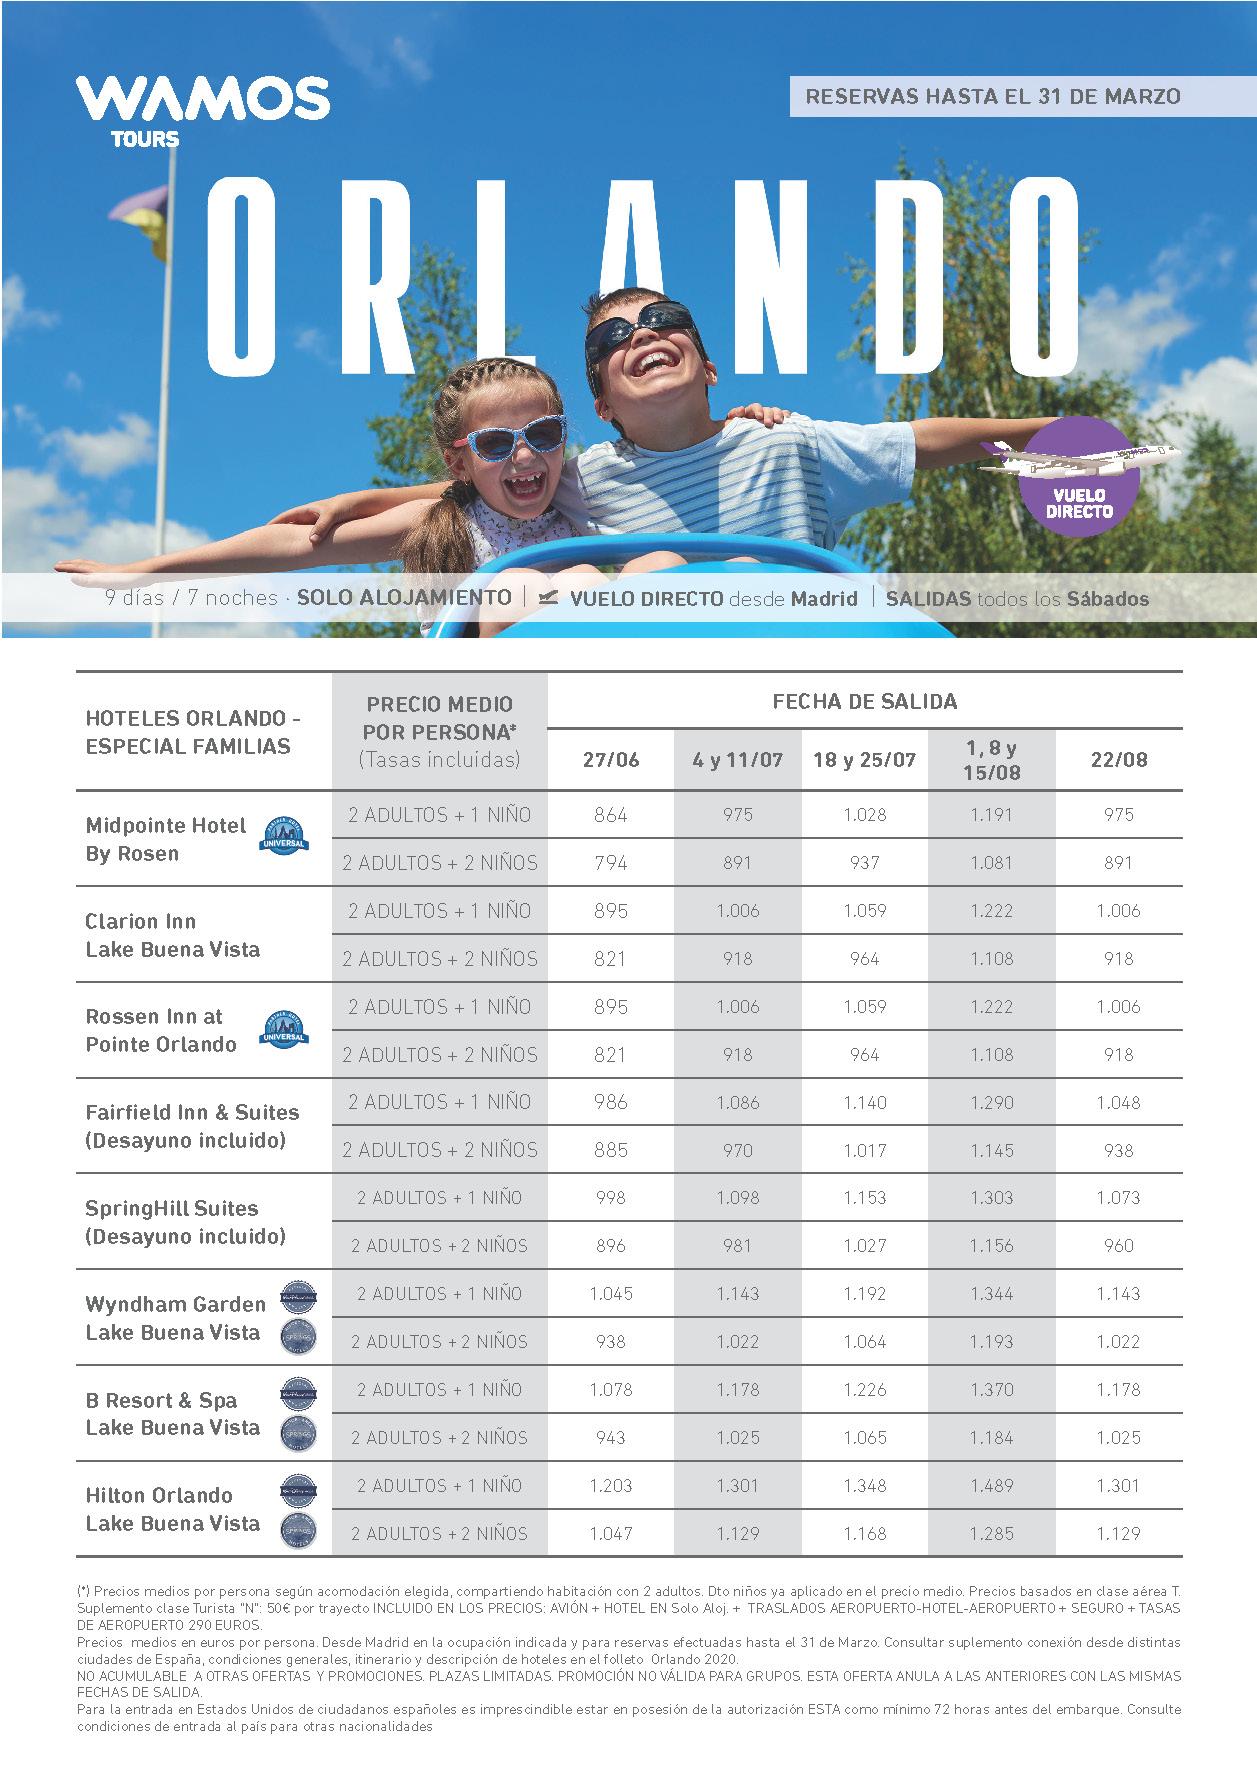 Superoferta Wamos Tours Orlando Verano 2020 reservas hasta 31 Marzo